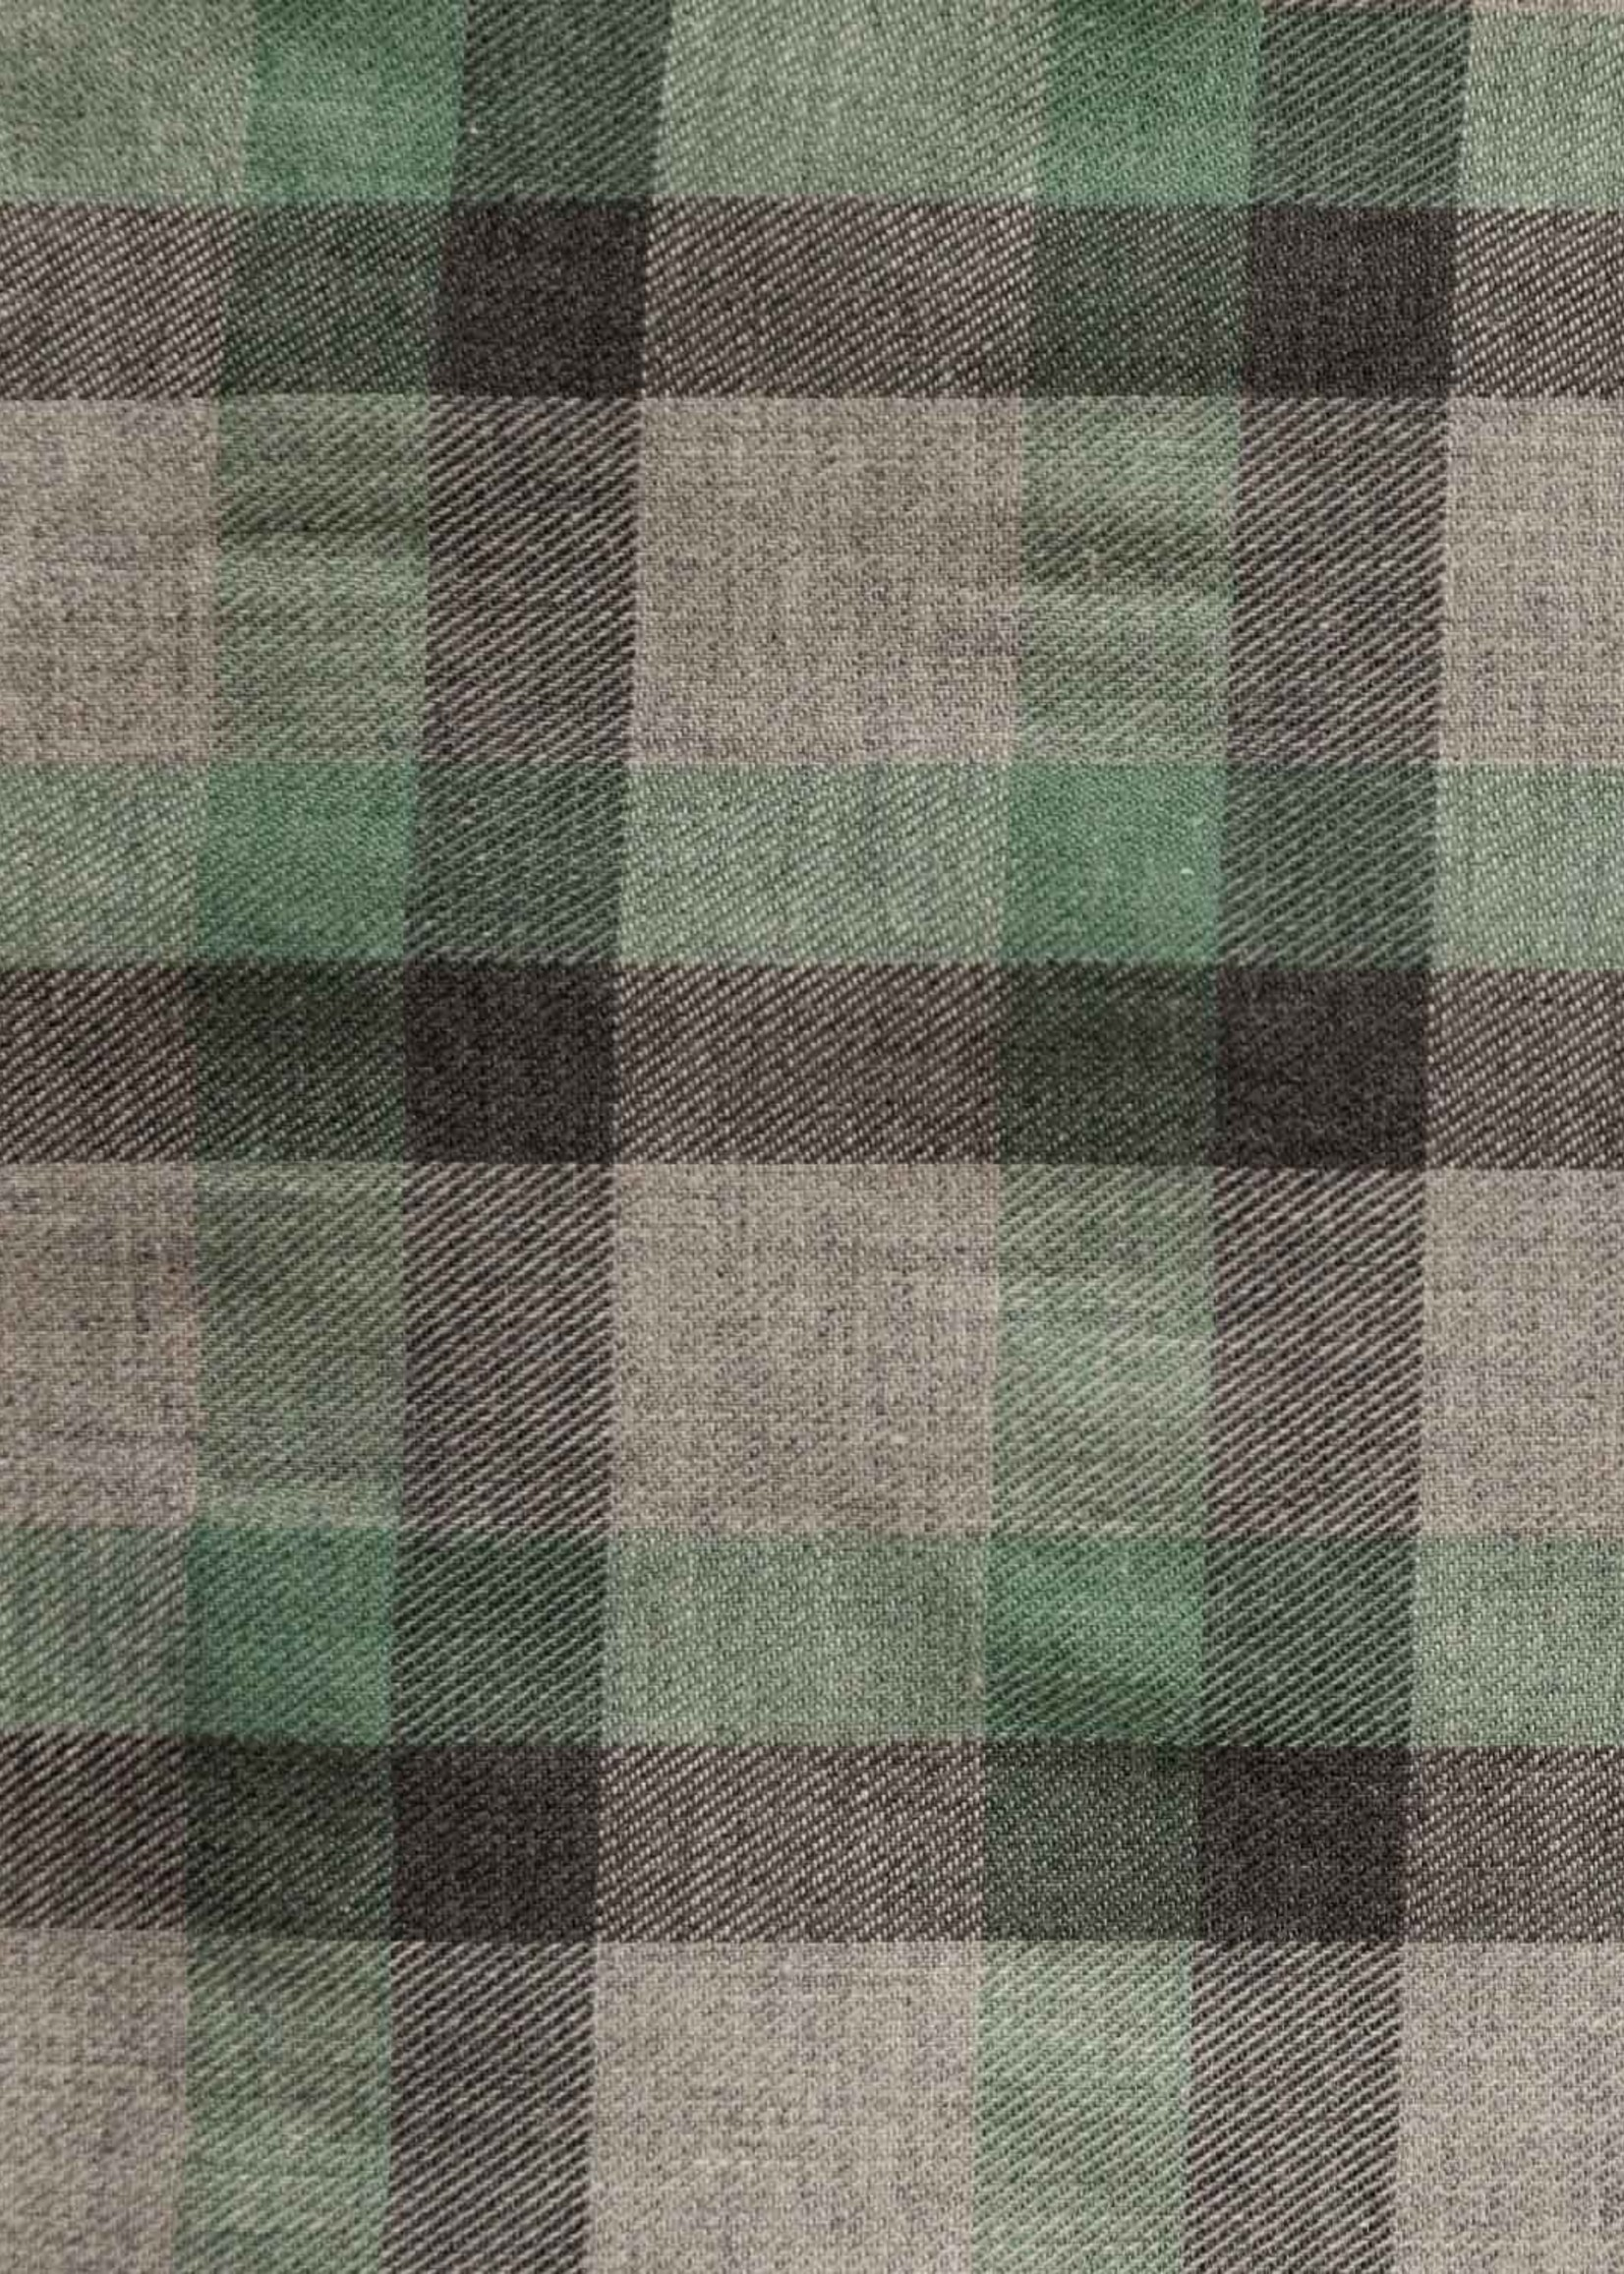 Katia Fabrics VIYELLA TARTAN FOREST